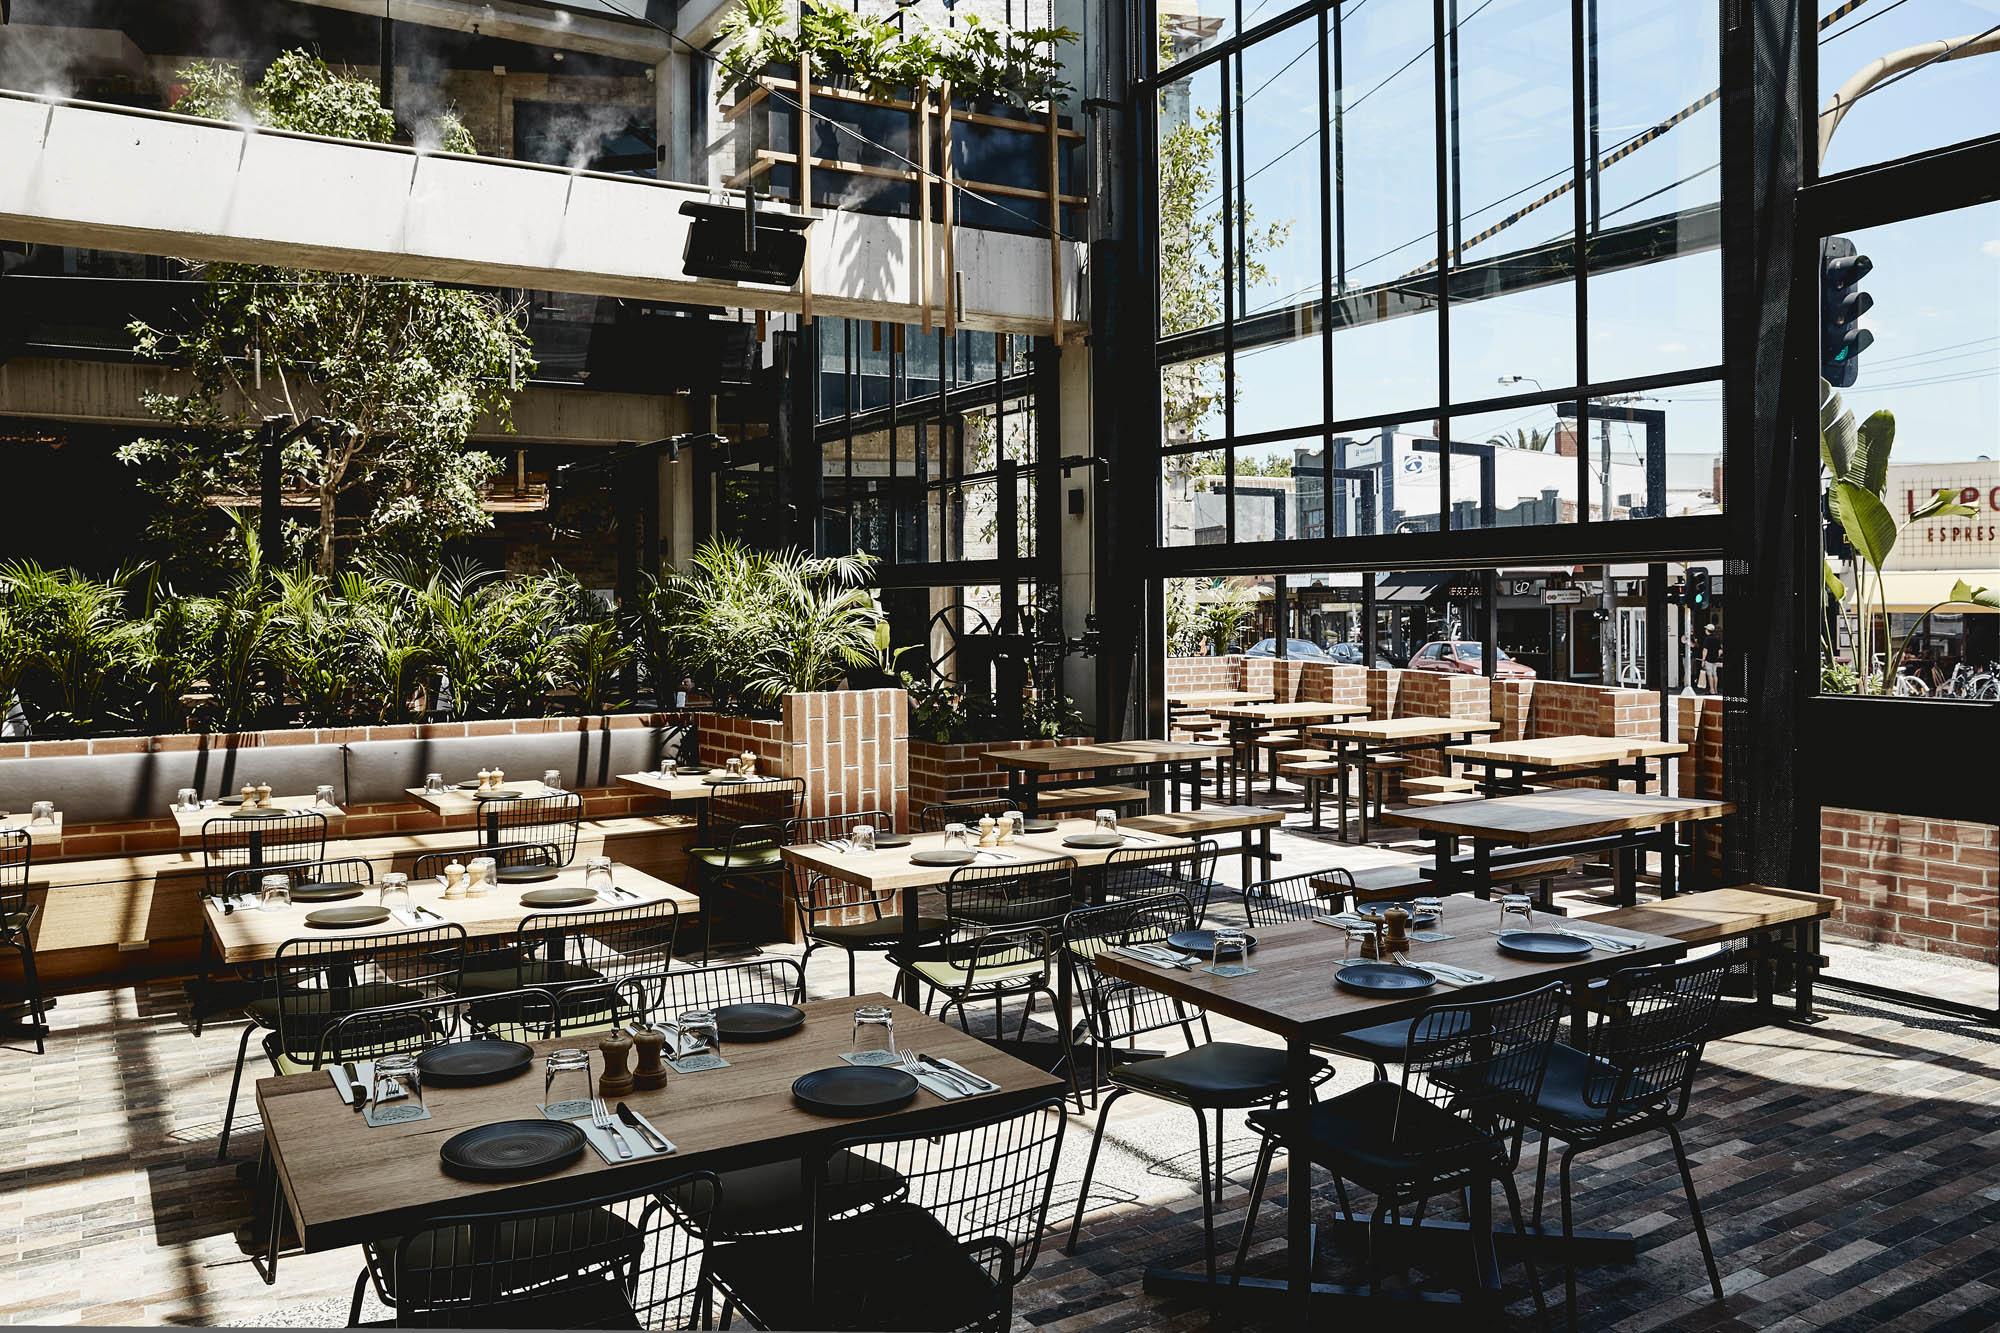 village belle hotel hospitality construction vic st kilda barkly st beer garden open area drinks summer melbourne